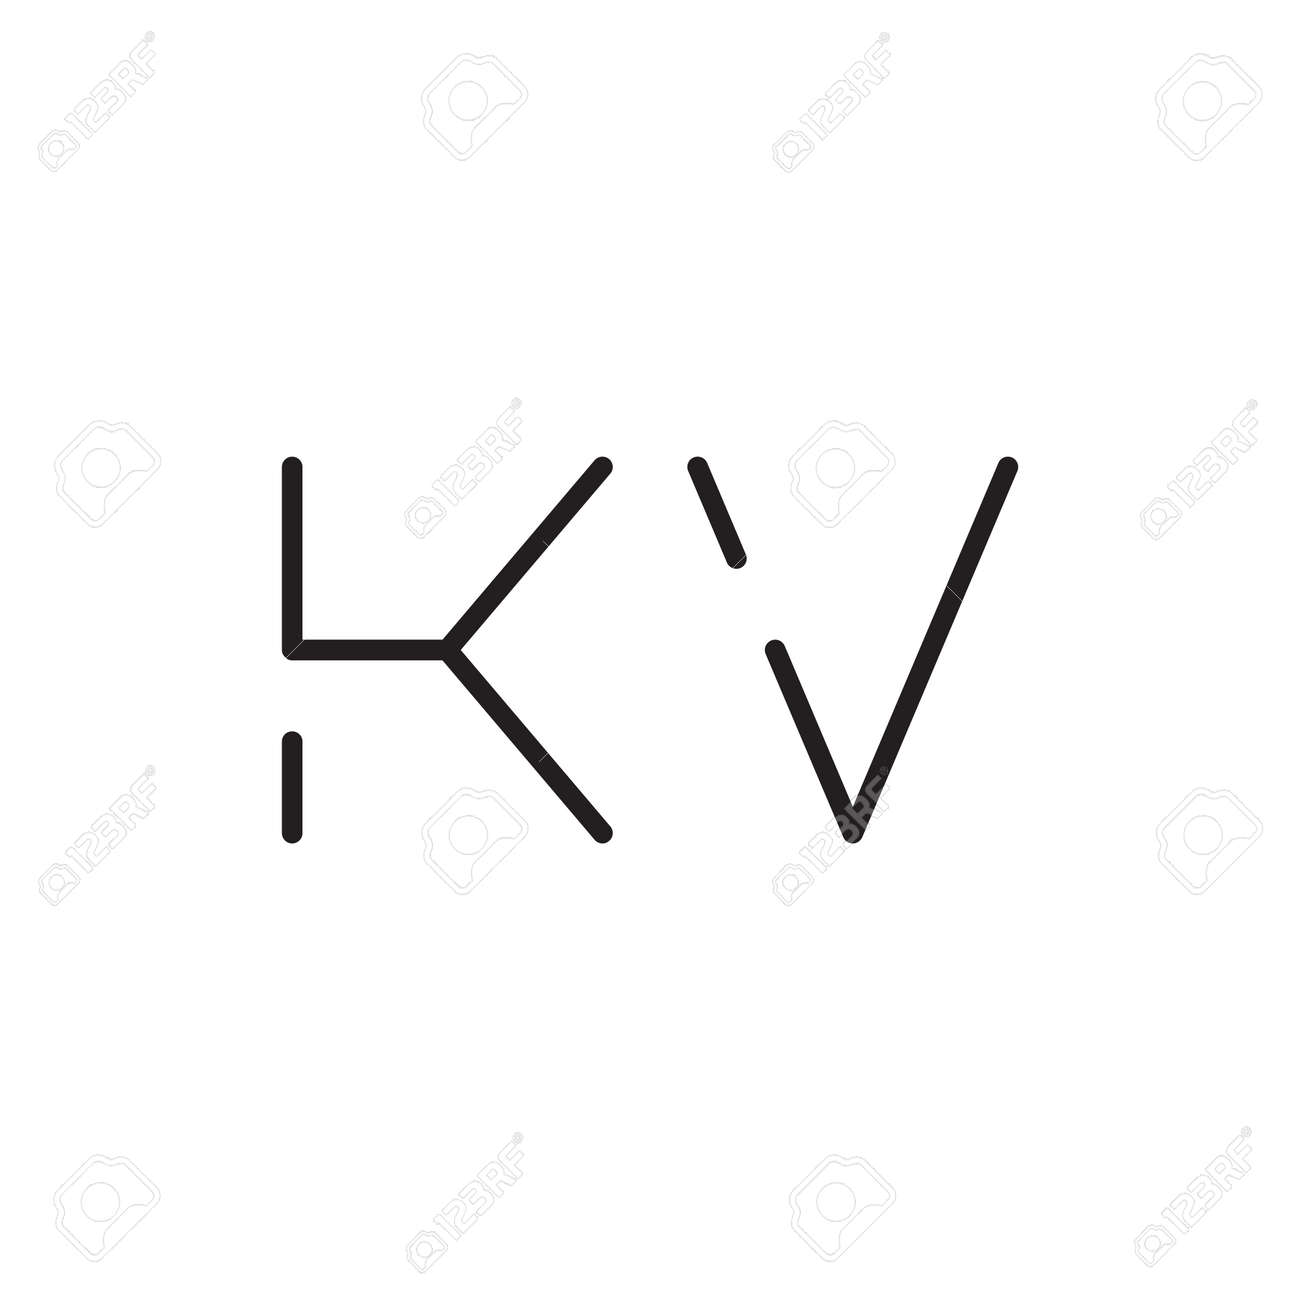 kv initial letter vector logo icon - 164323496